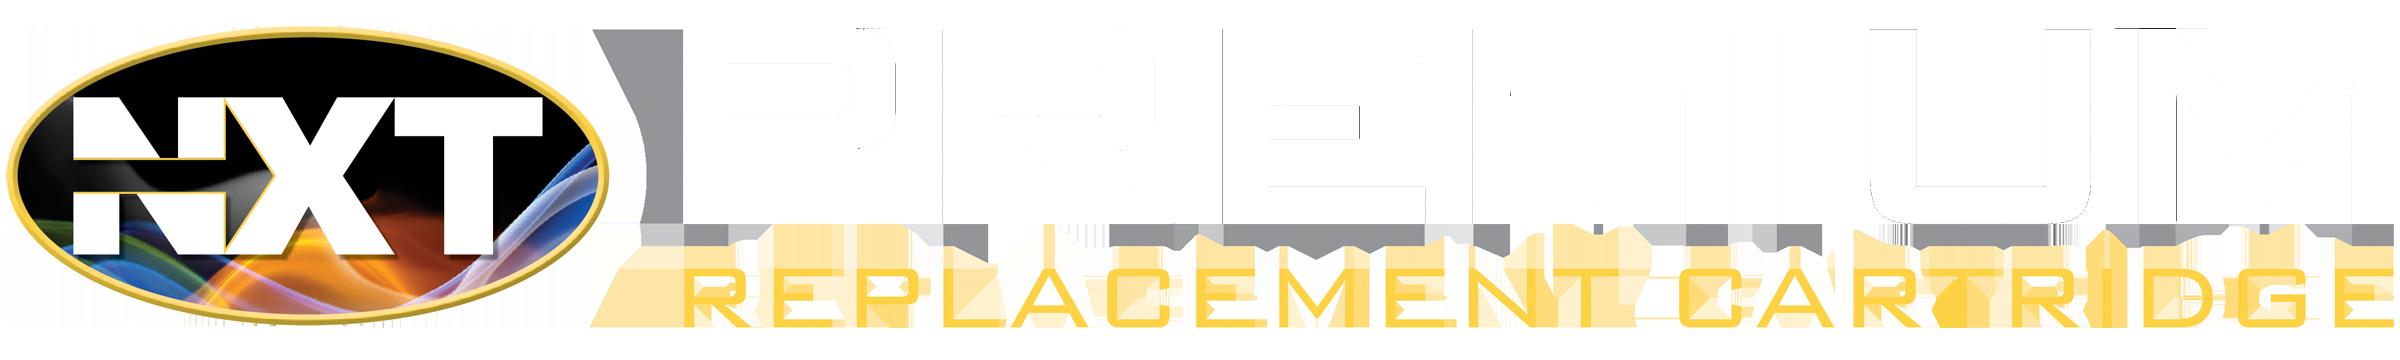 NXT Premium Replacement Cartridge